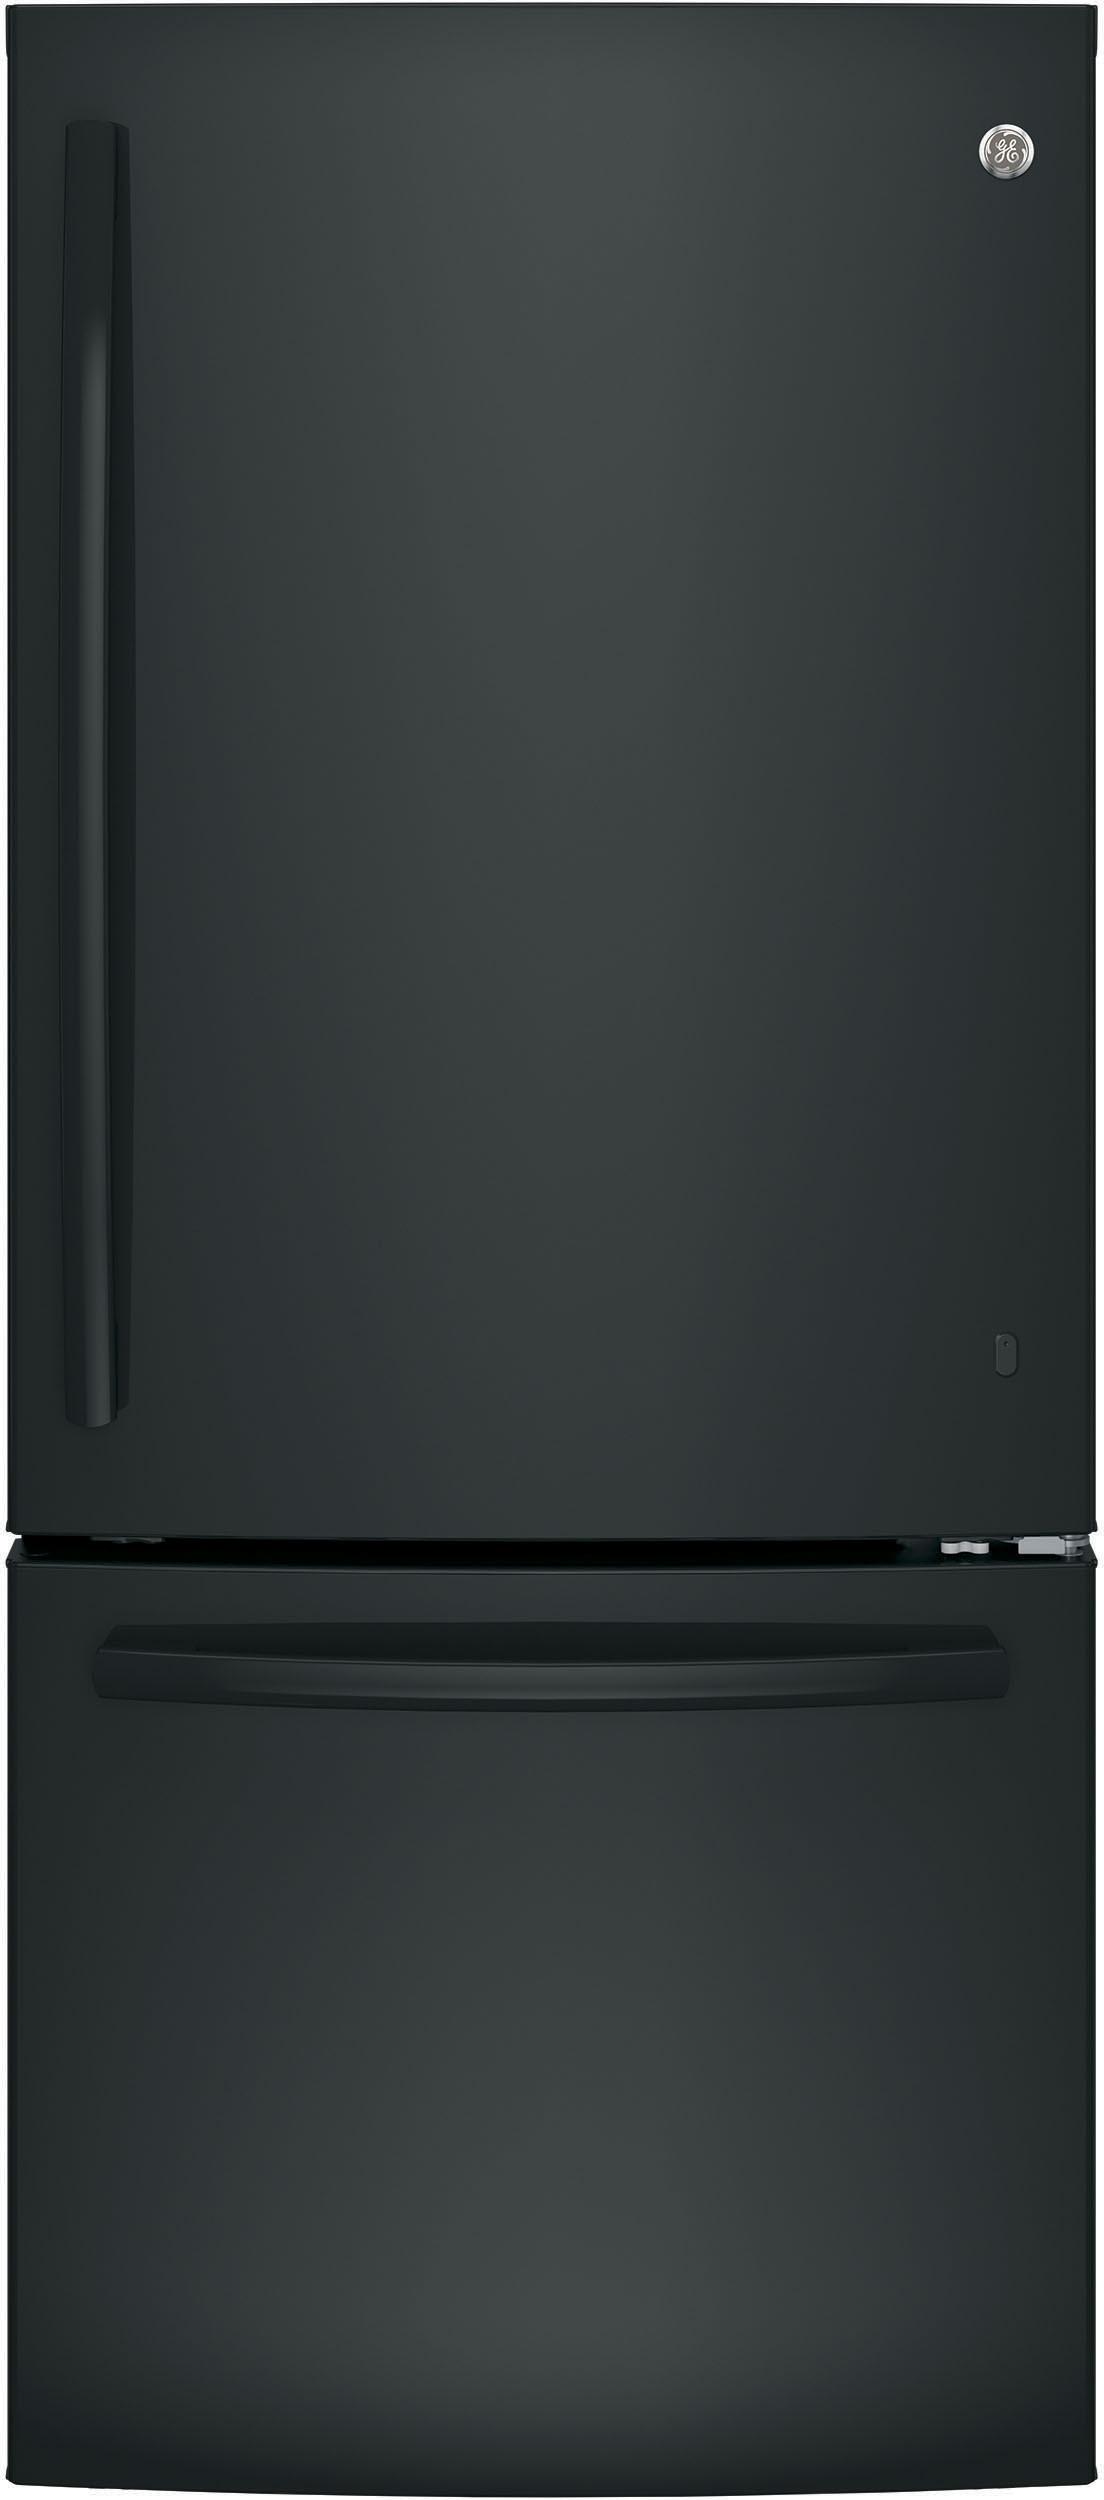 Ge Gbe21dgkbb 30 Inch Bottom Freezer Refrigerator With 20 9 Cu Ft Capacity Led Lighting 2 Ad Bottom Freezer Adjustable Shelving Bottom Freezer Refrigerator